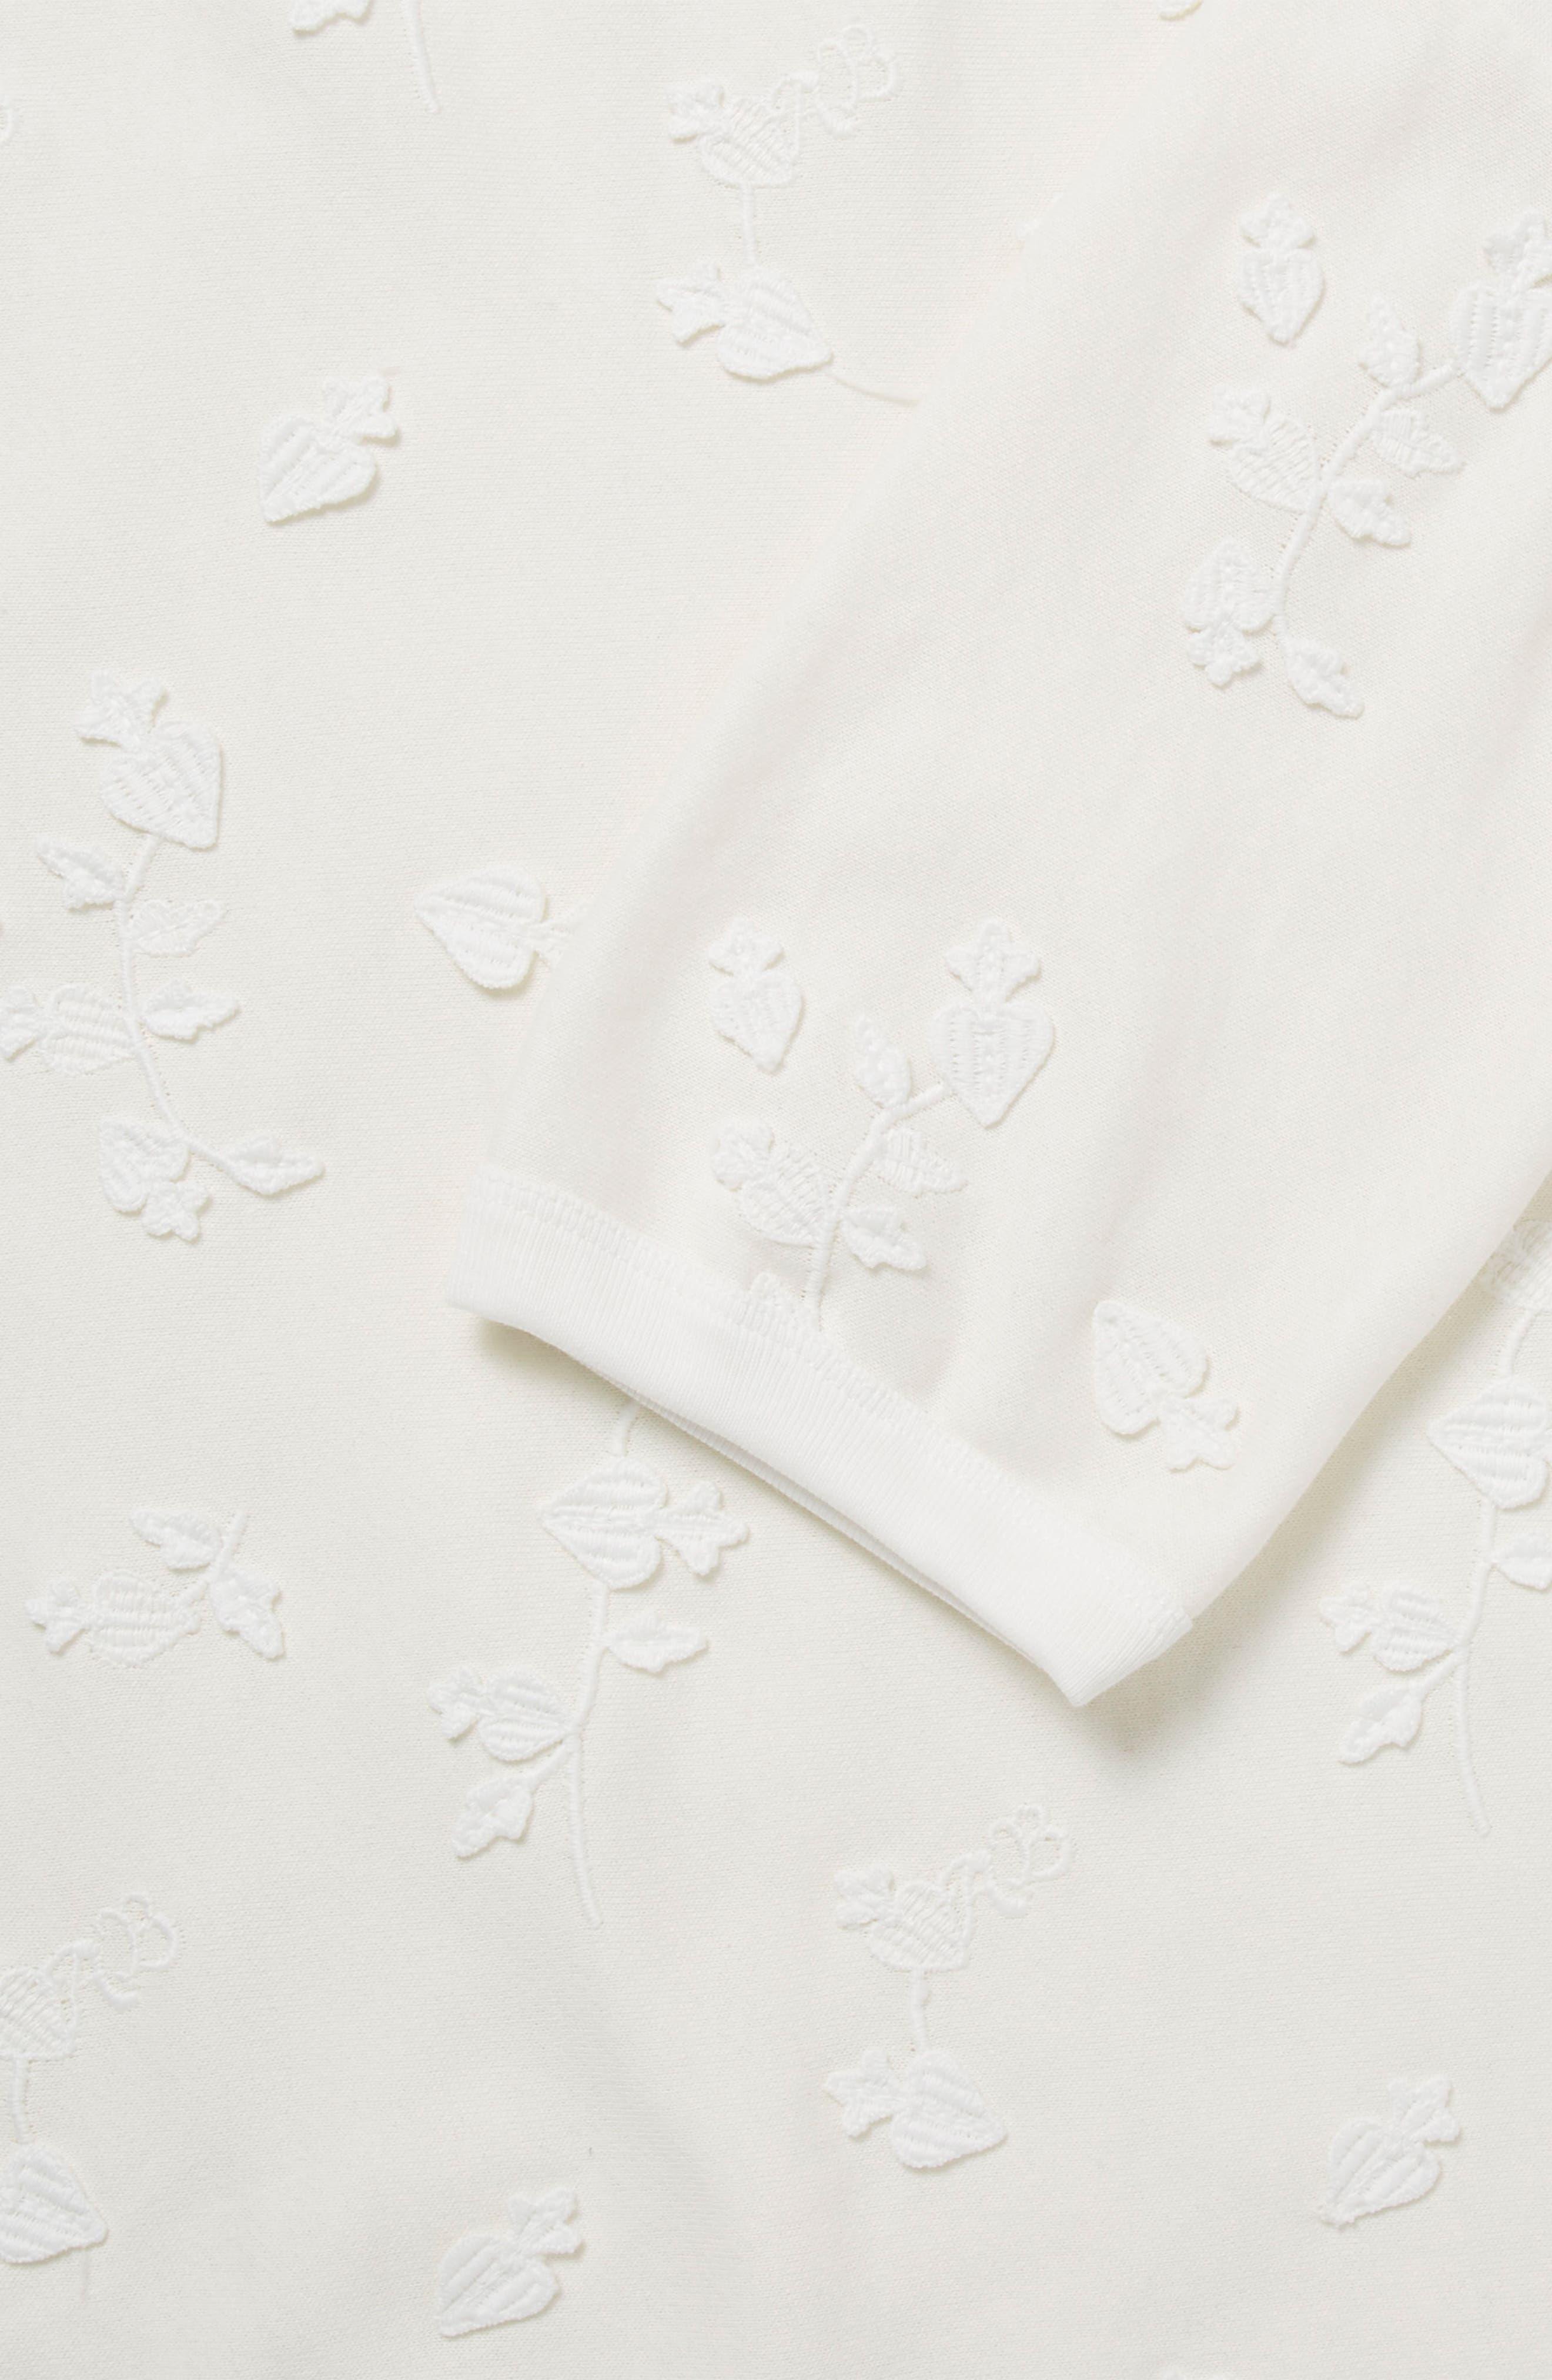 Tonal Embroidered Sweatshirt,                             Alternate thumbnail 3, color,                             01 Denim White